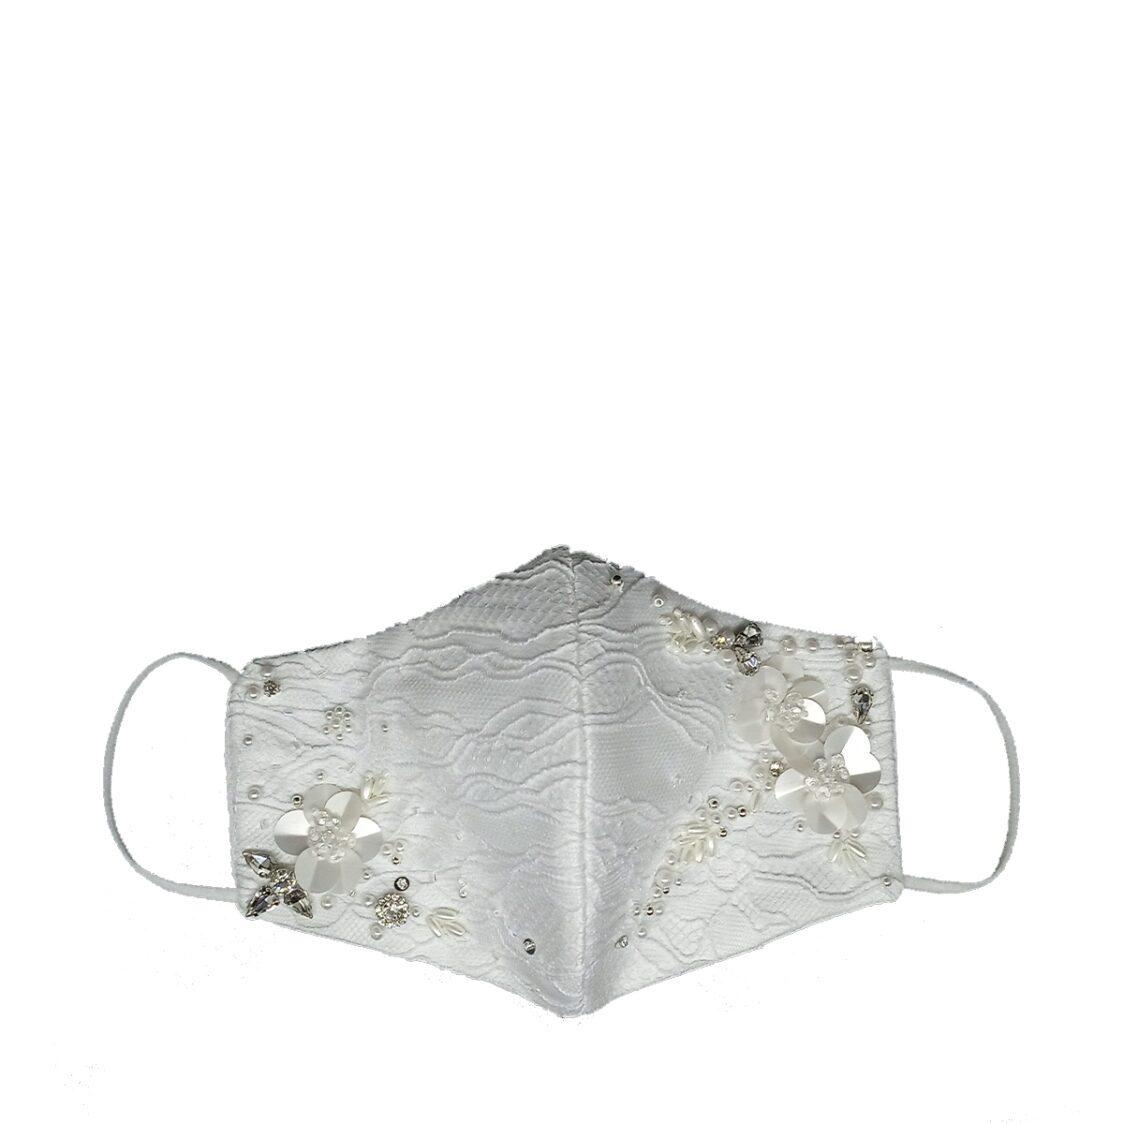 Gayatri Mask - Lace Beads White